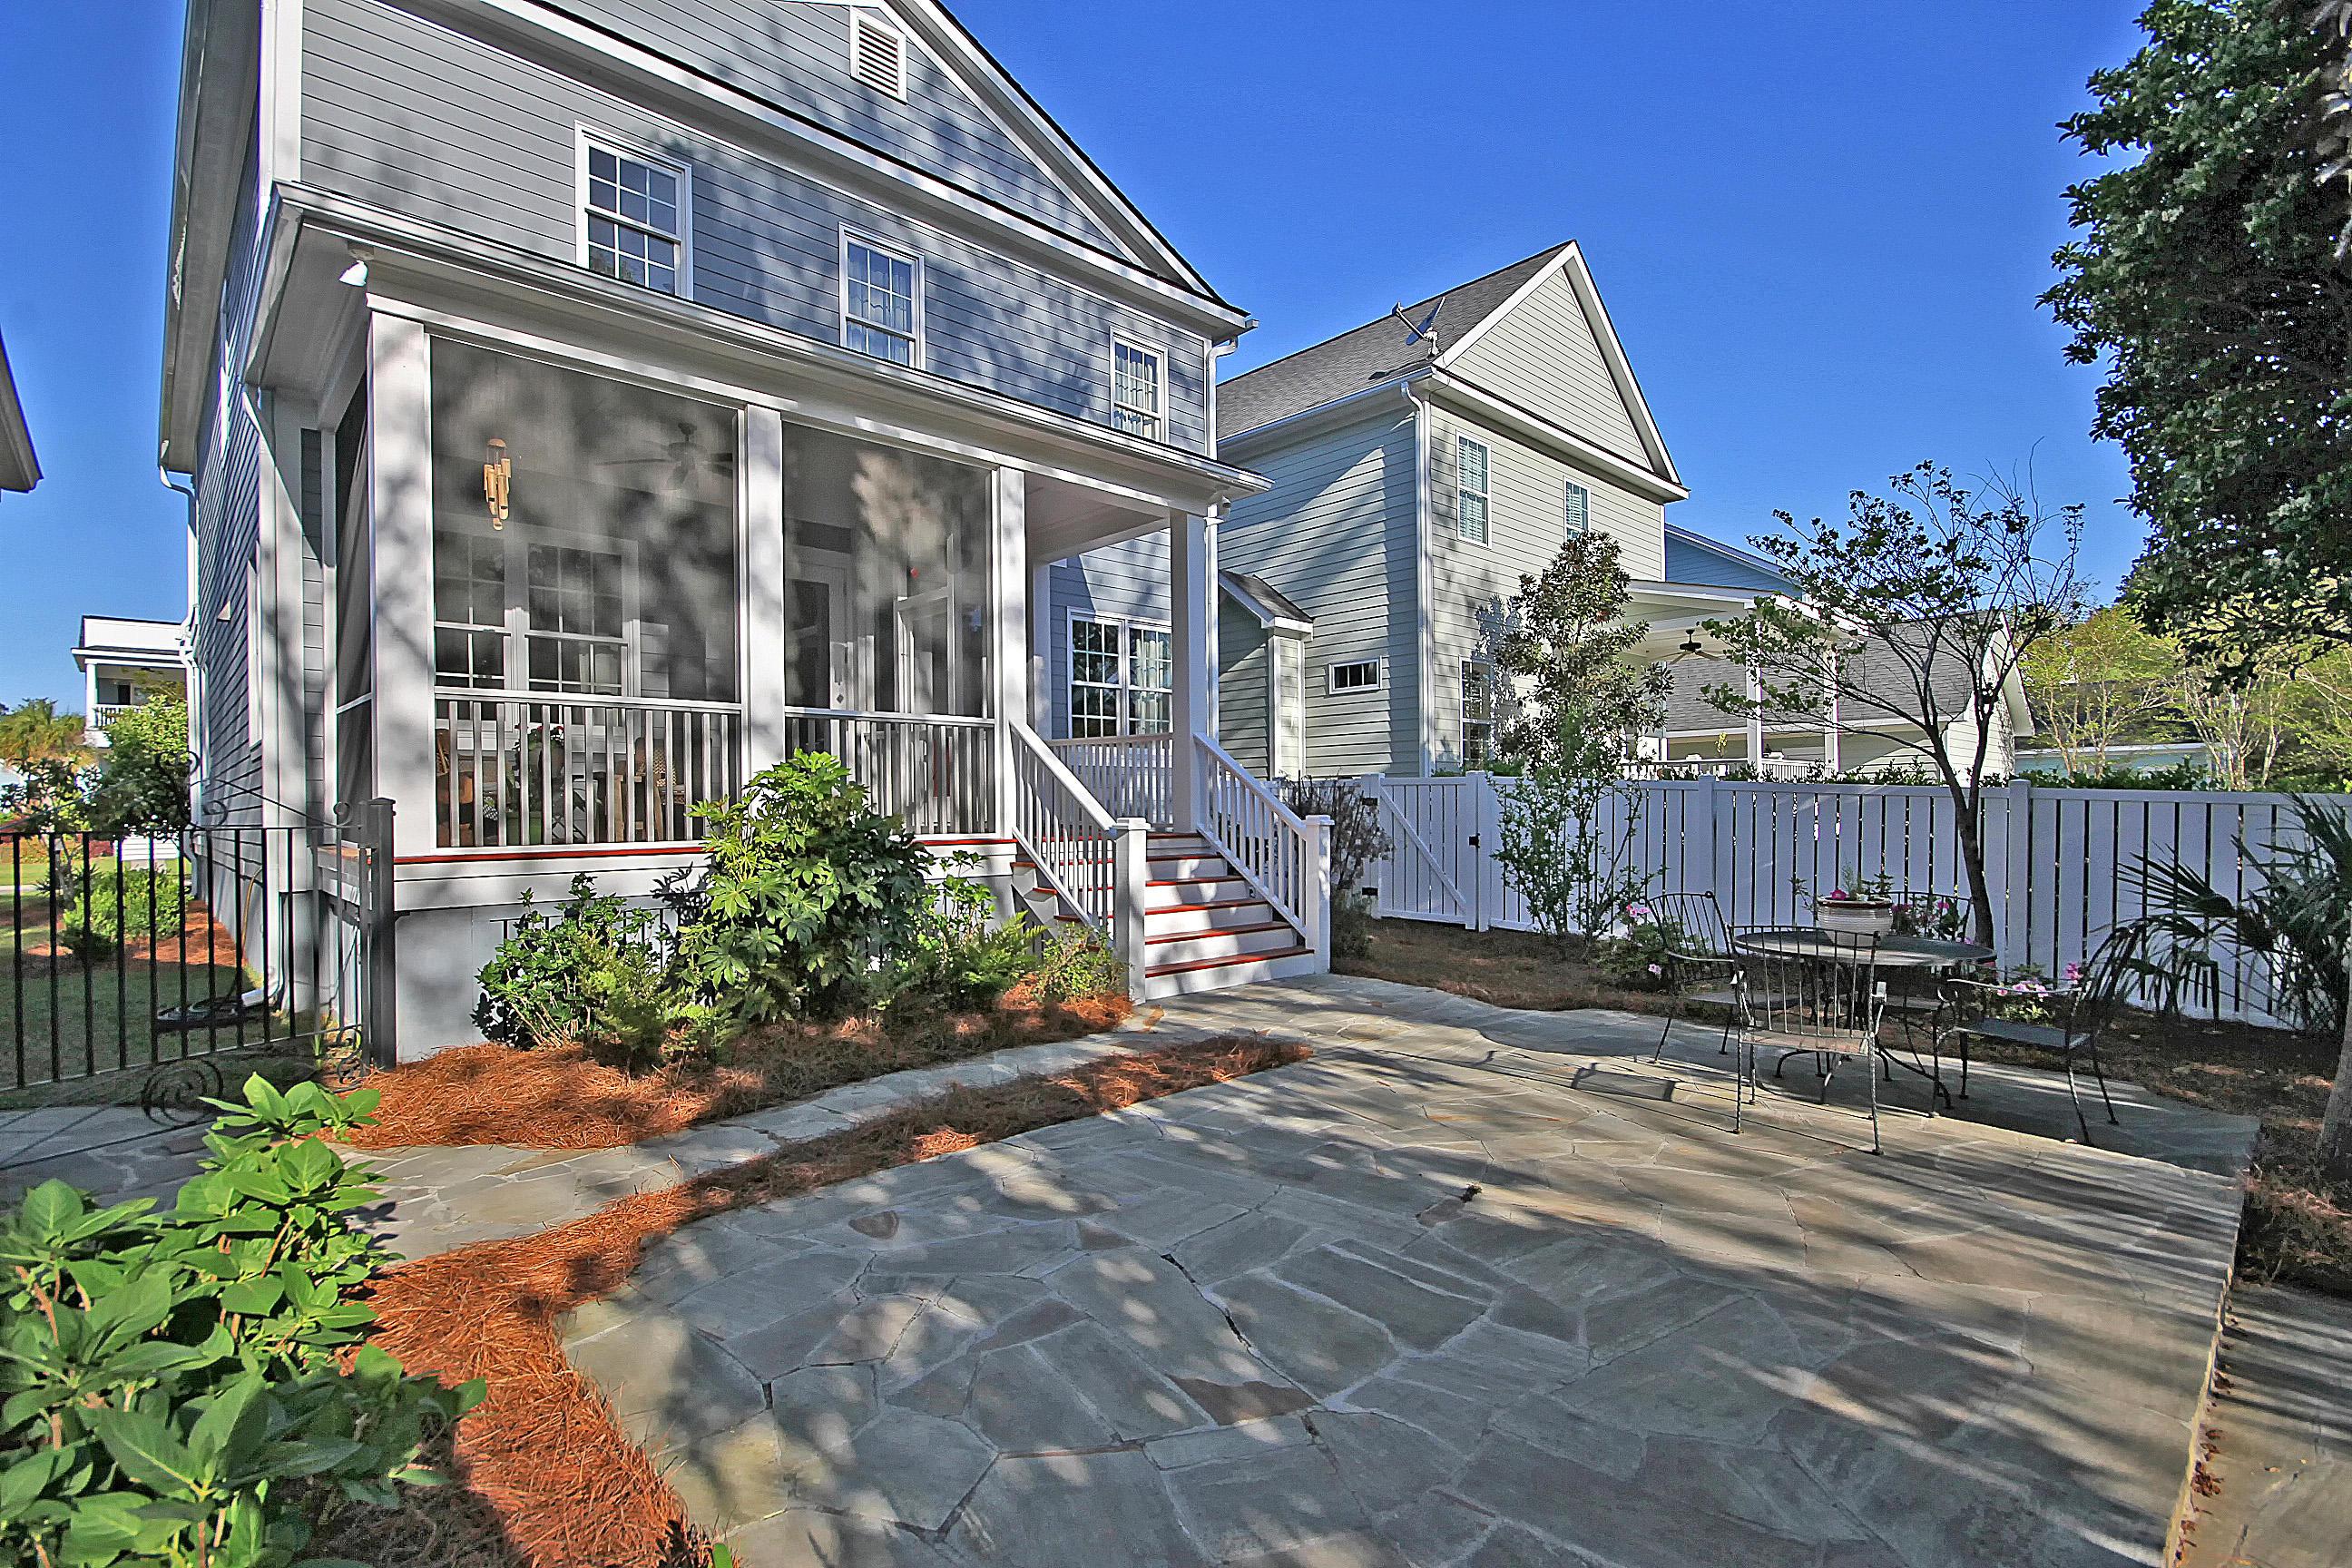 Cloudbreak Court Homes For Sale - 638 Cloudbreak, Charleston, SC - 35